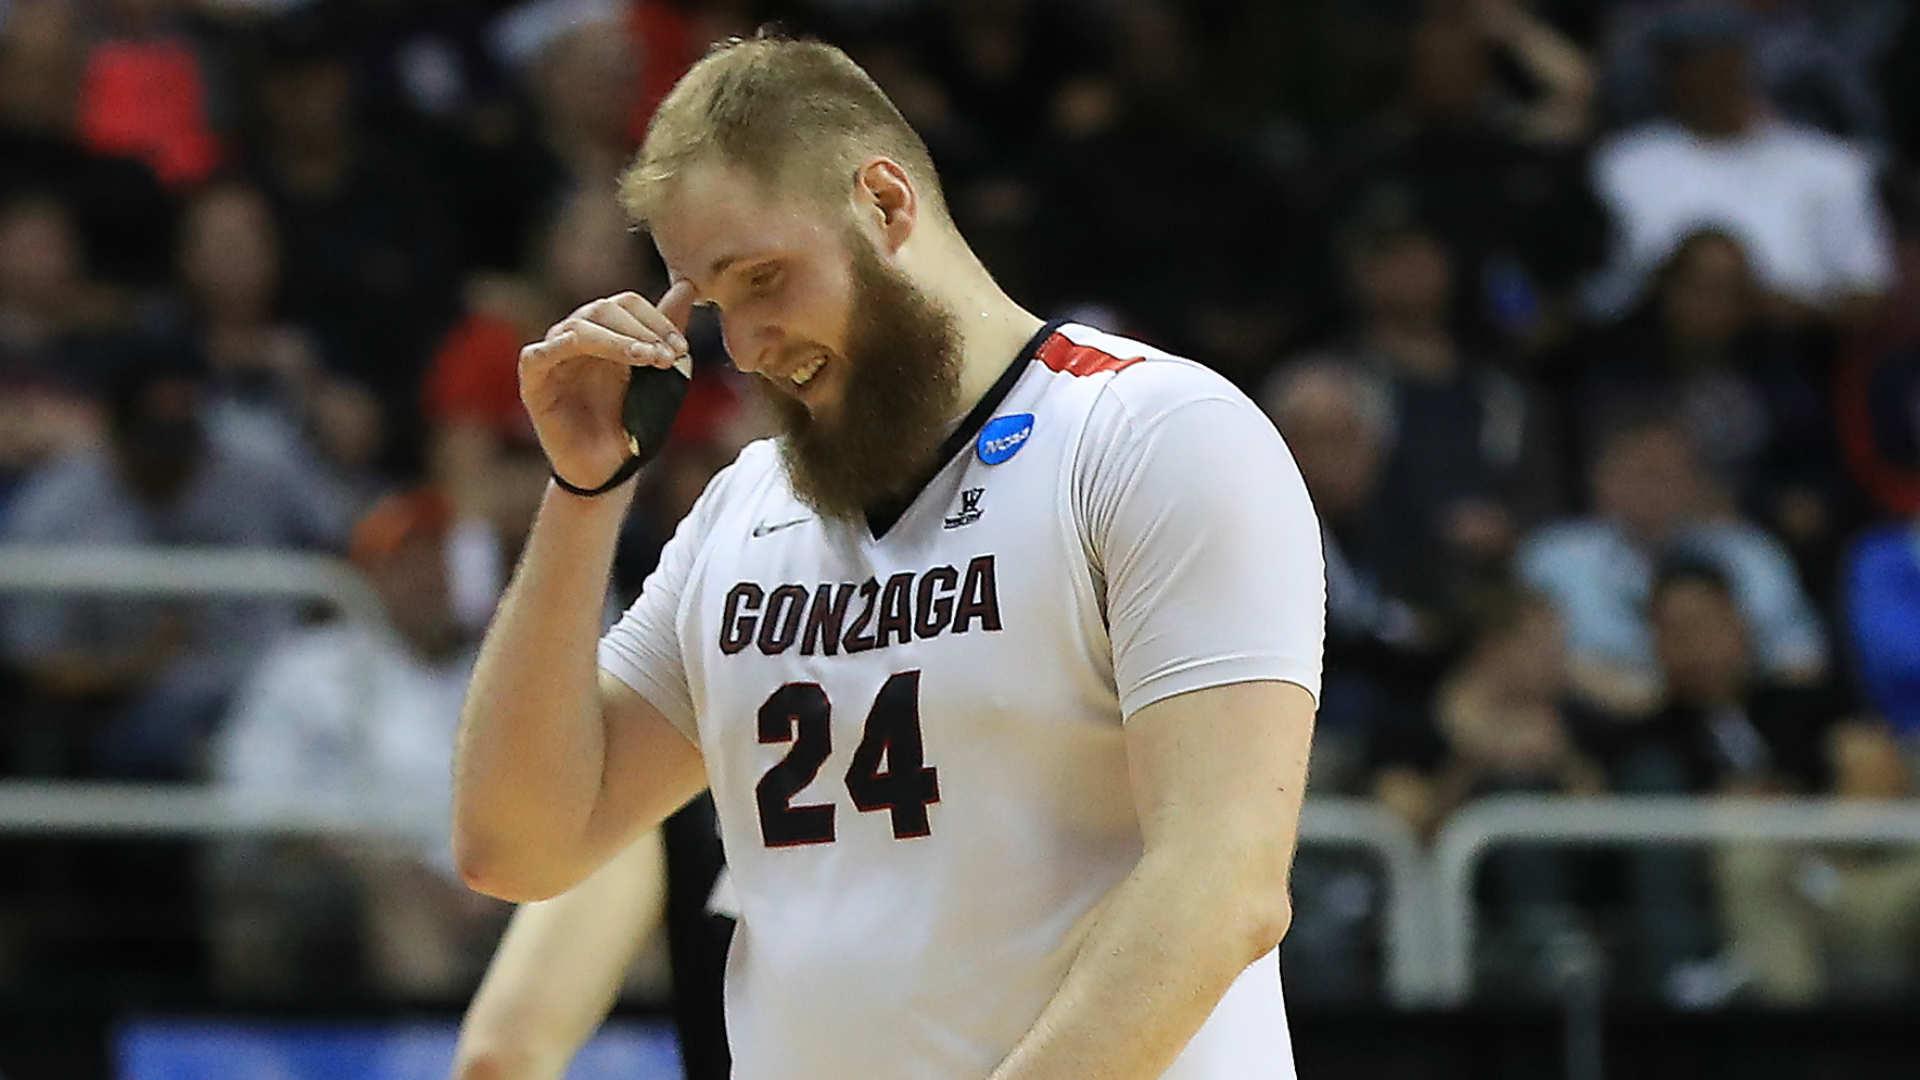 premium selection b3614 62457 Final Four  Gonzaga center Przemek Karnowski hit in eye after huge Chris  Silva block